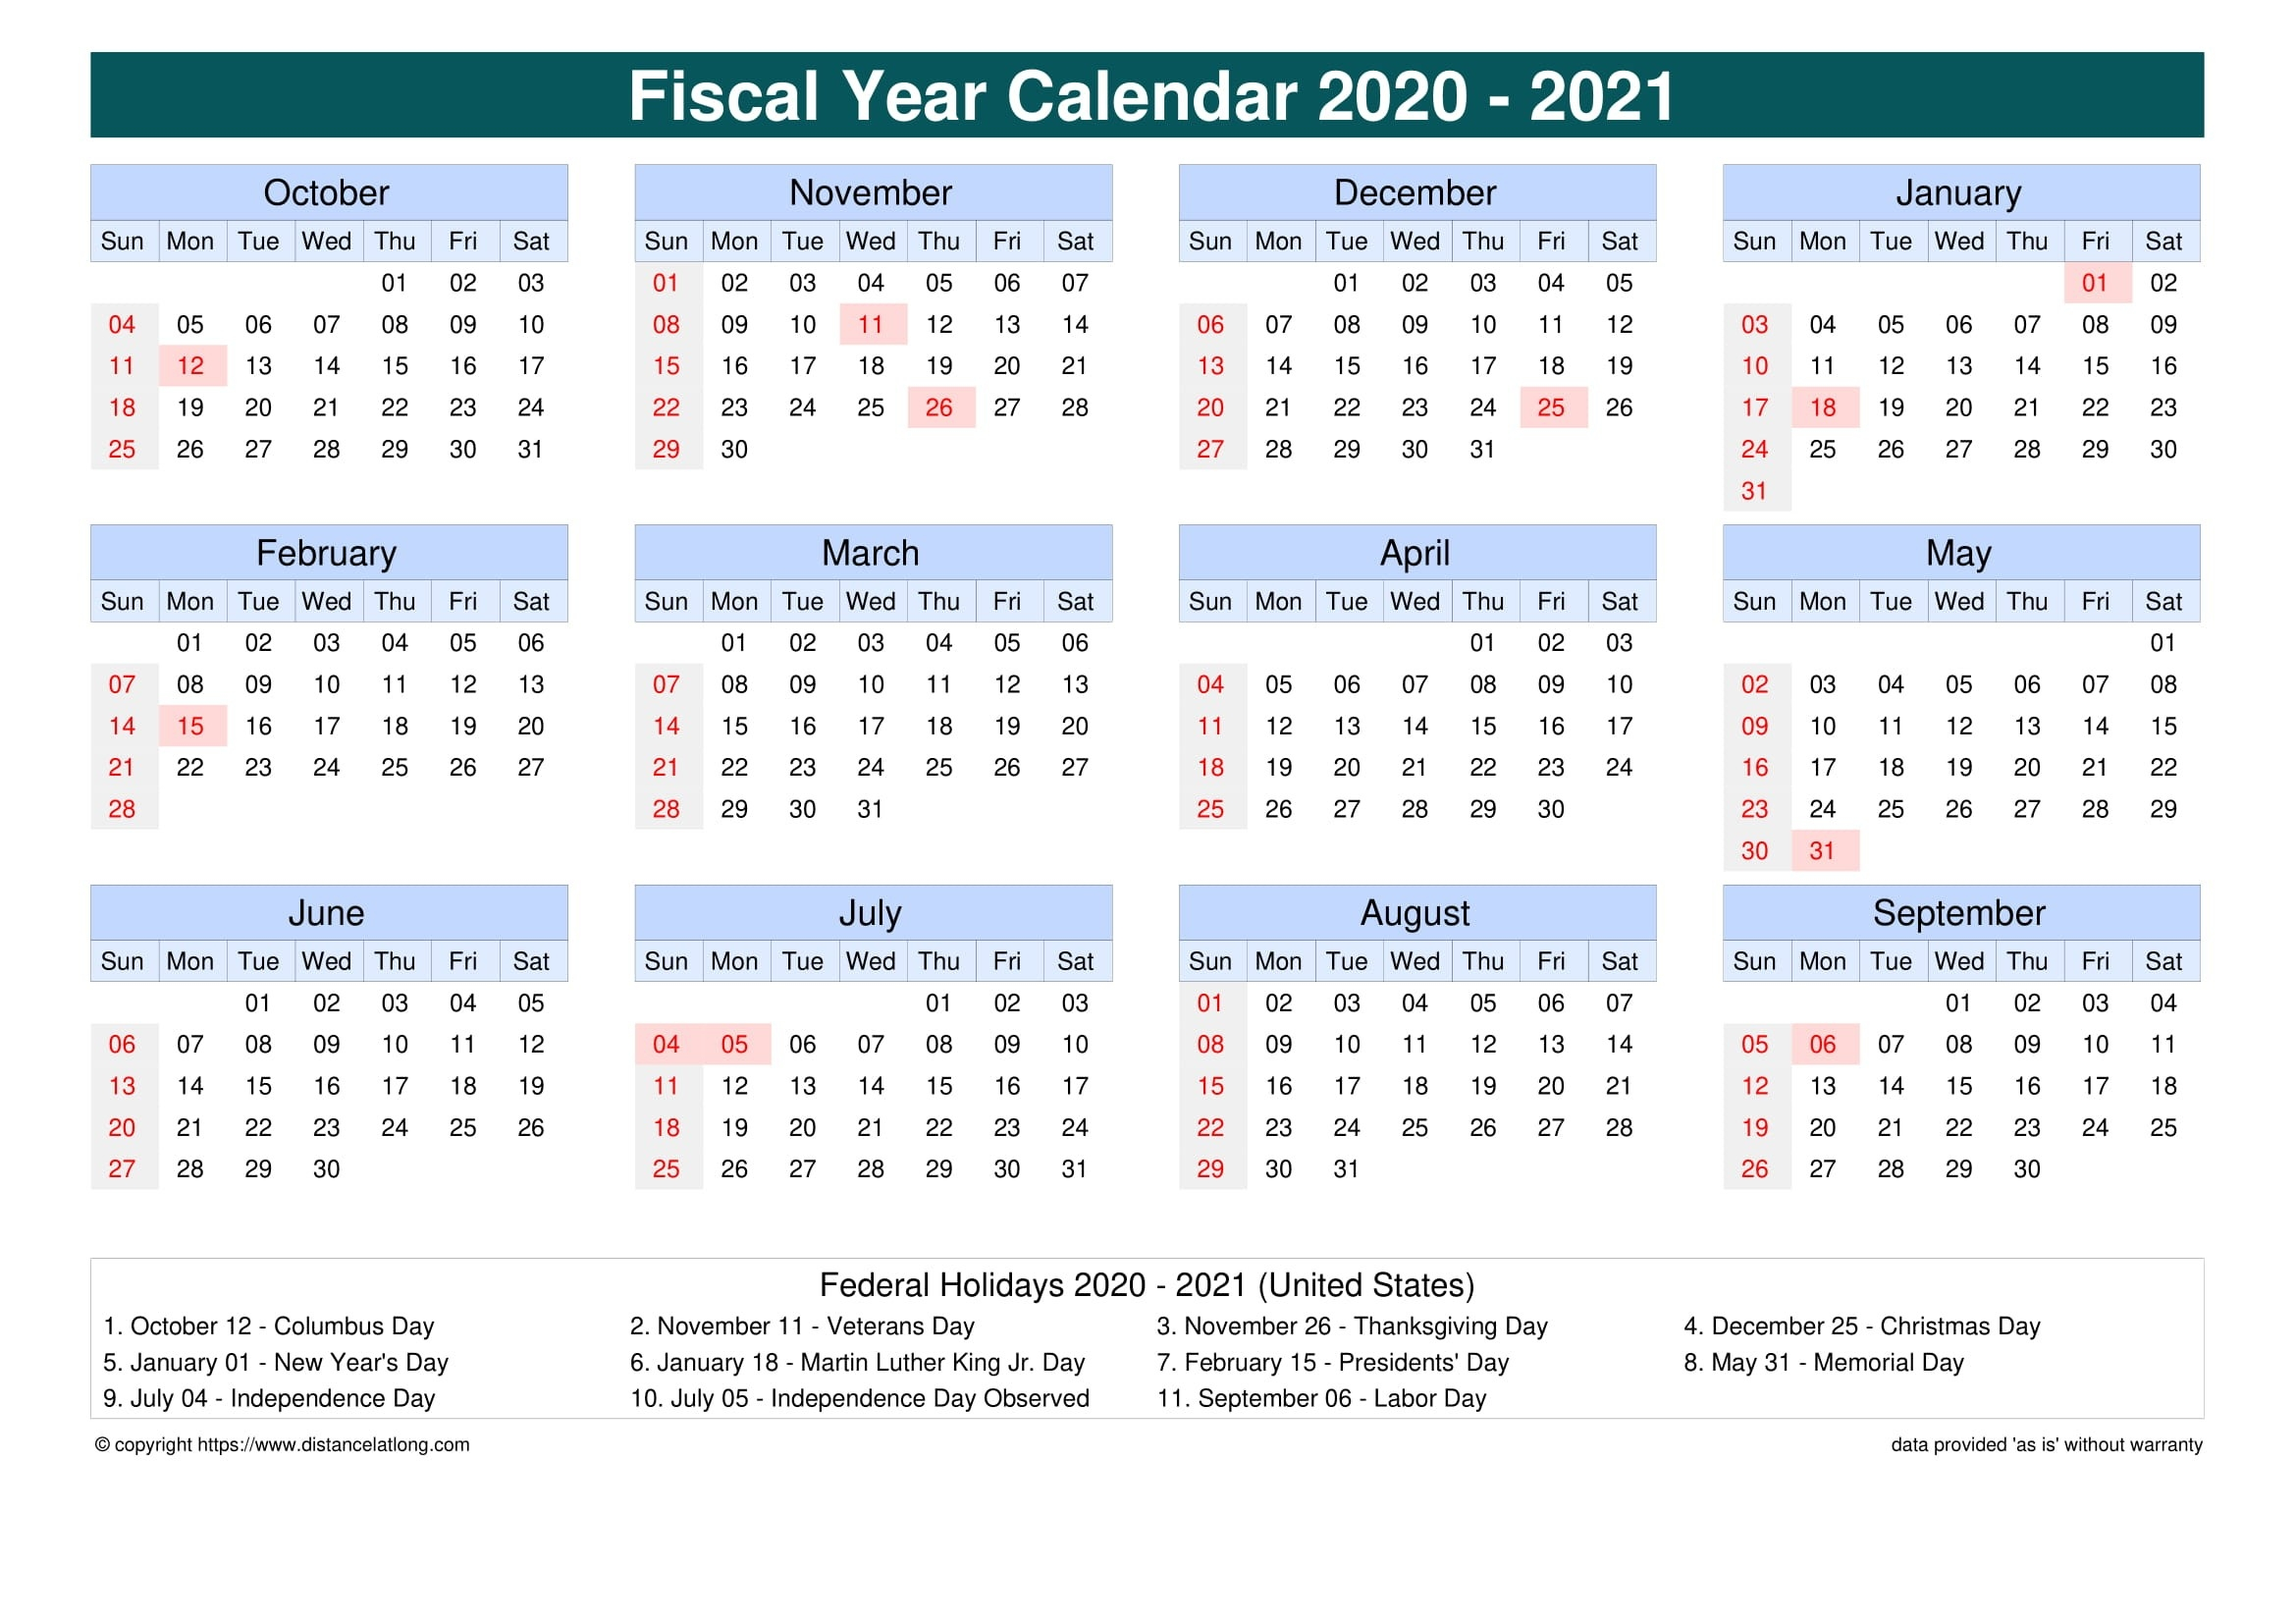 Fiscal Year 2020-2021 Calendar Templates, Free Printable  Financial Year Calendar 2021 19 Australia